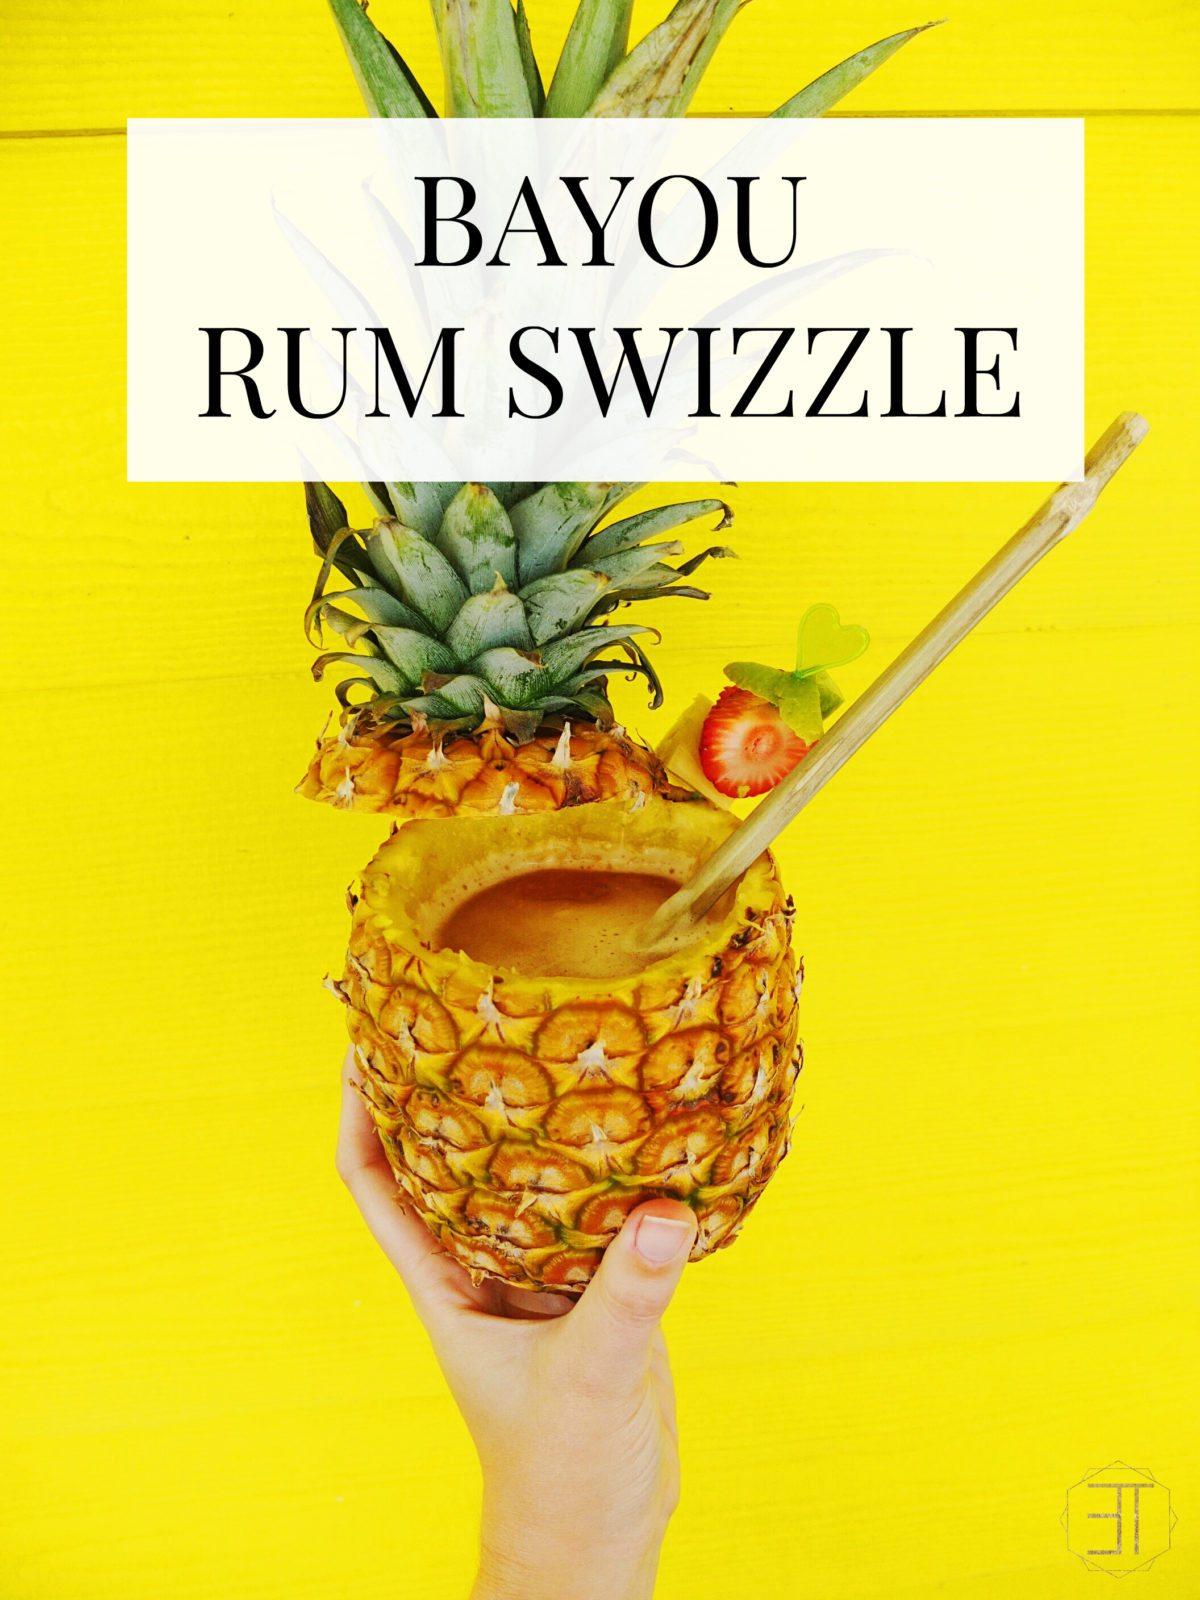 Bayou Rum Swizzle